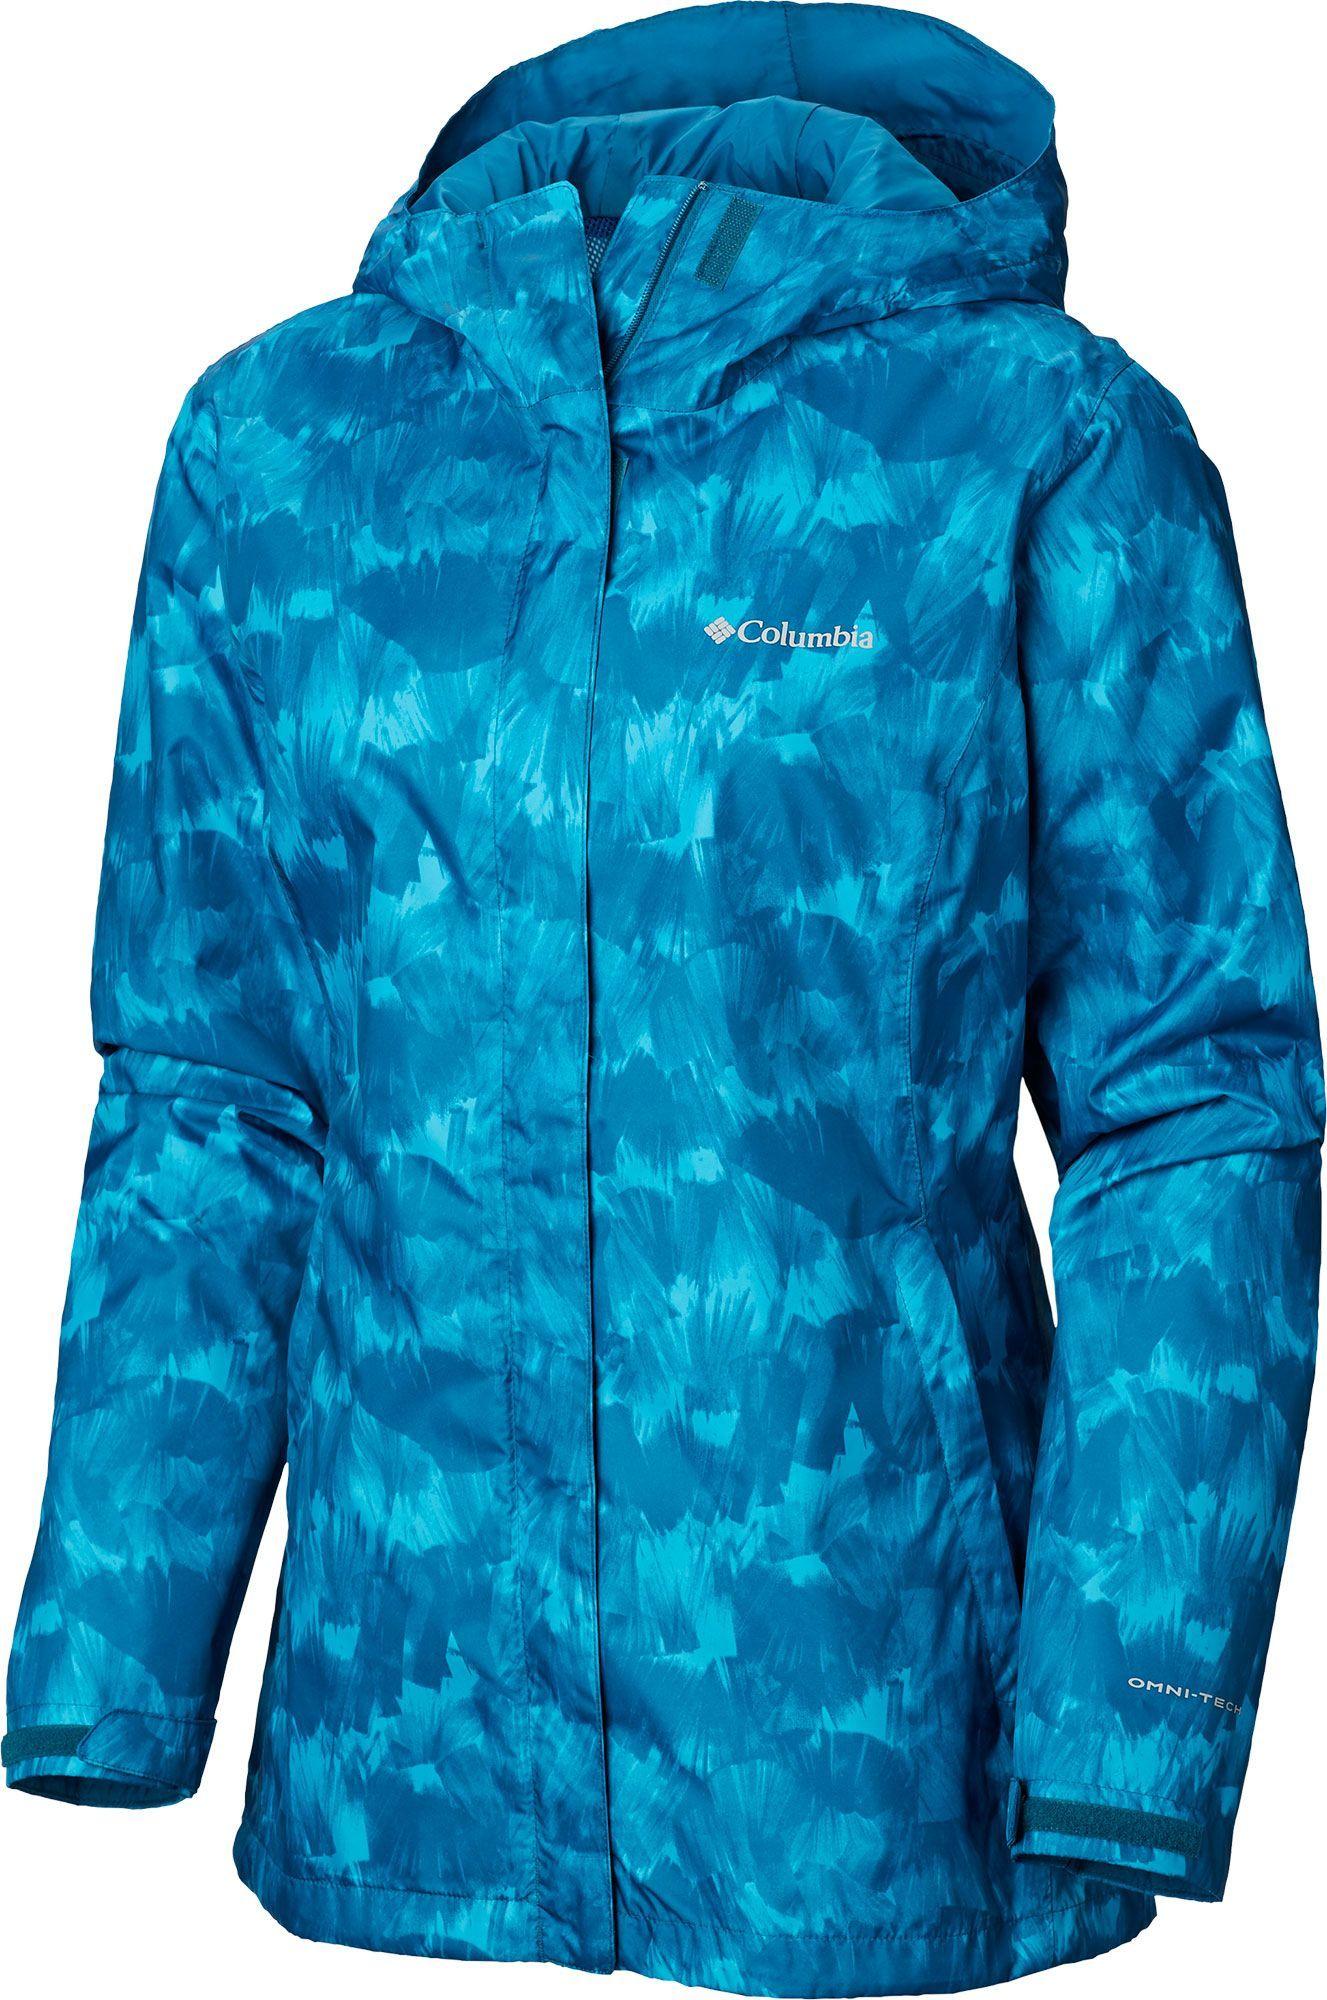 Columbia Women S Arcadia Print Rain Jacket Size Medium Siberia Quartz Print Rain Jacket Jackets Columbia